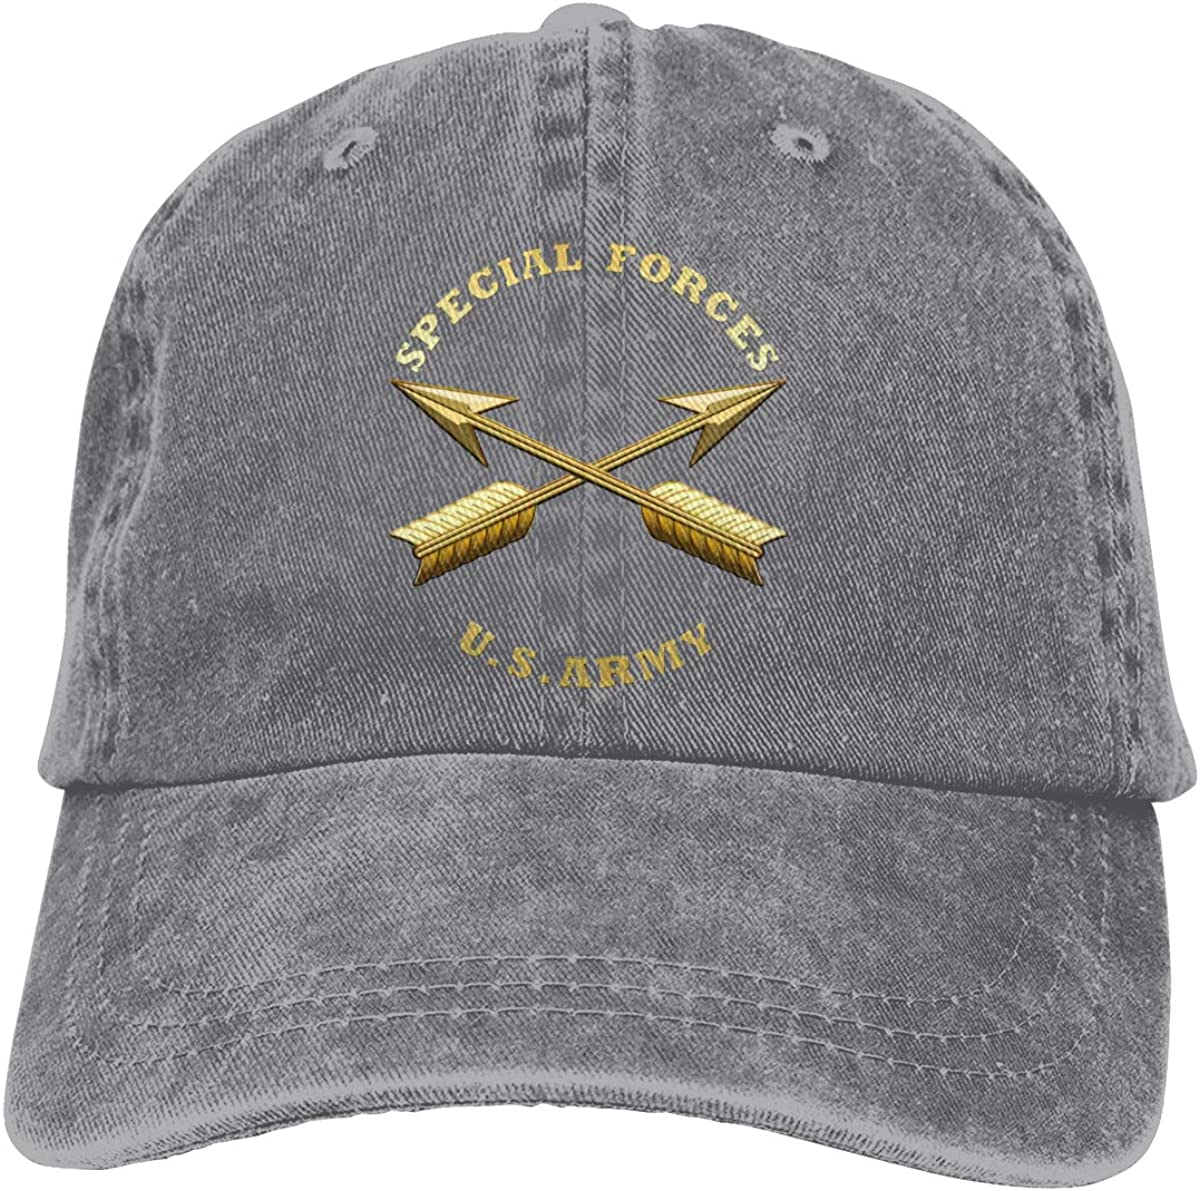 Army Special Forces Unisex Trucker Hats Dad Baseball Hats Driver Cap AKFJ NKJA U.S